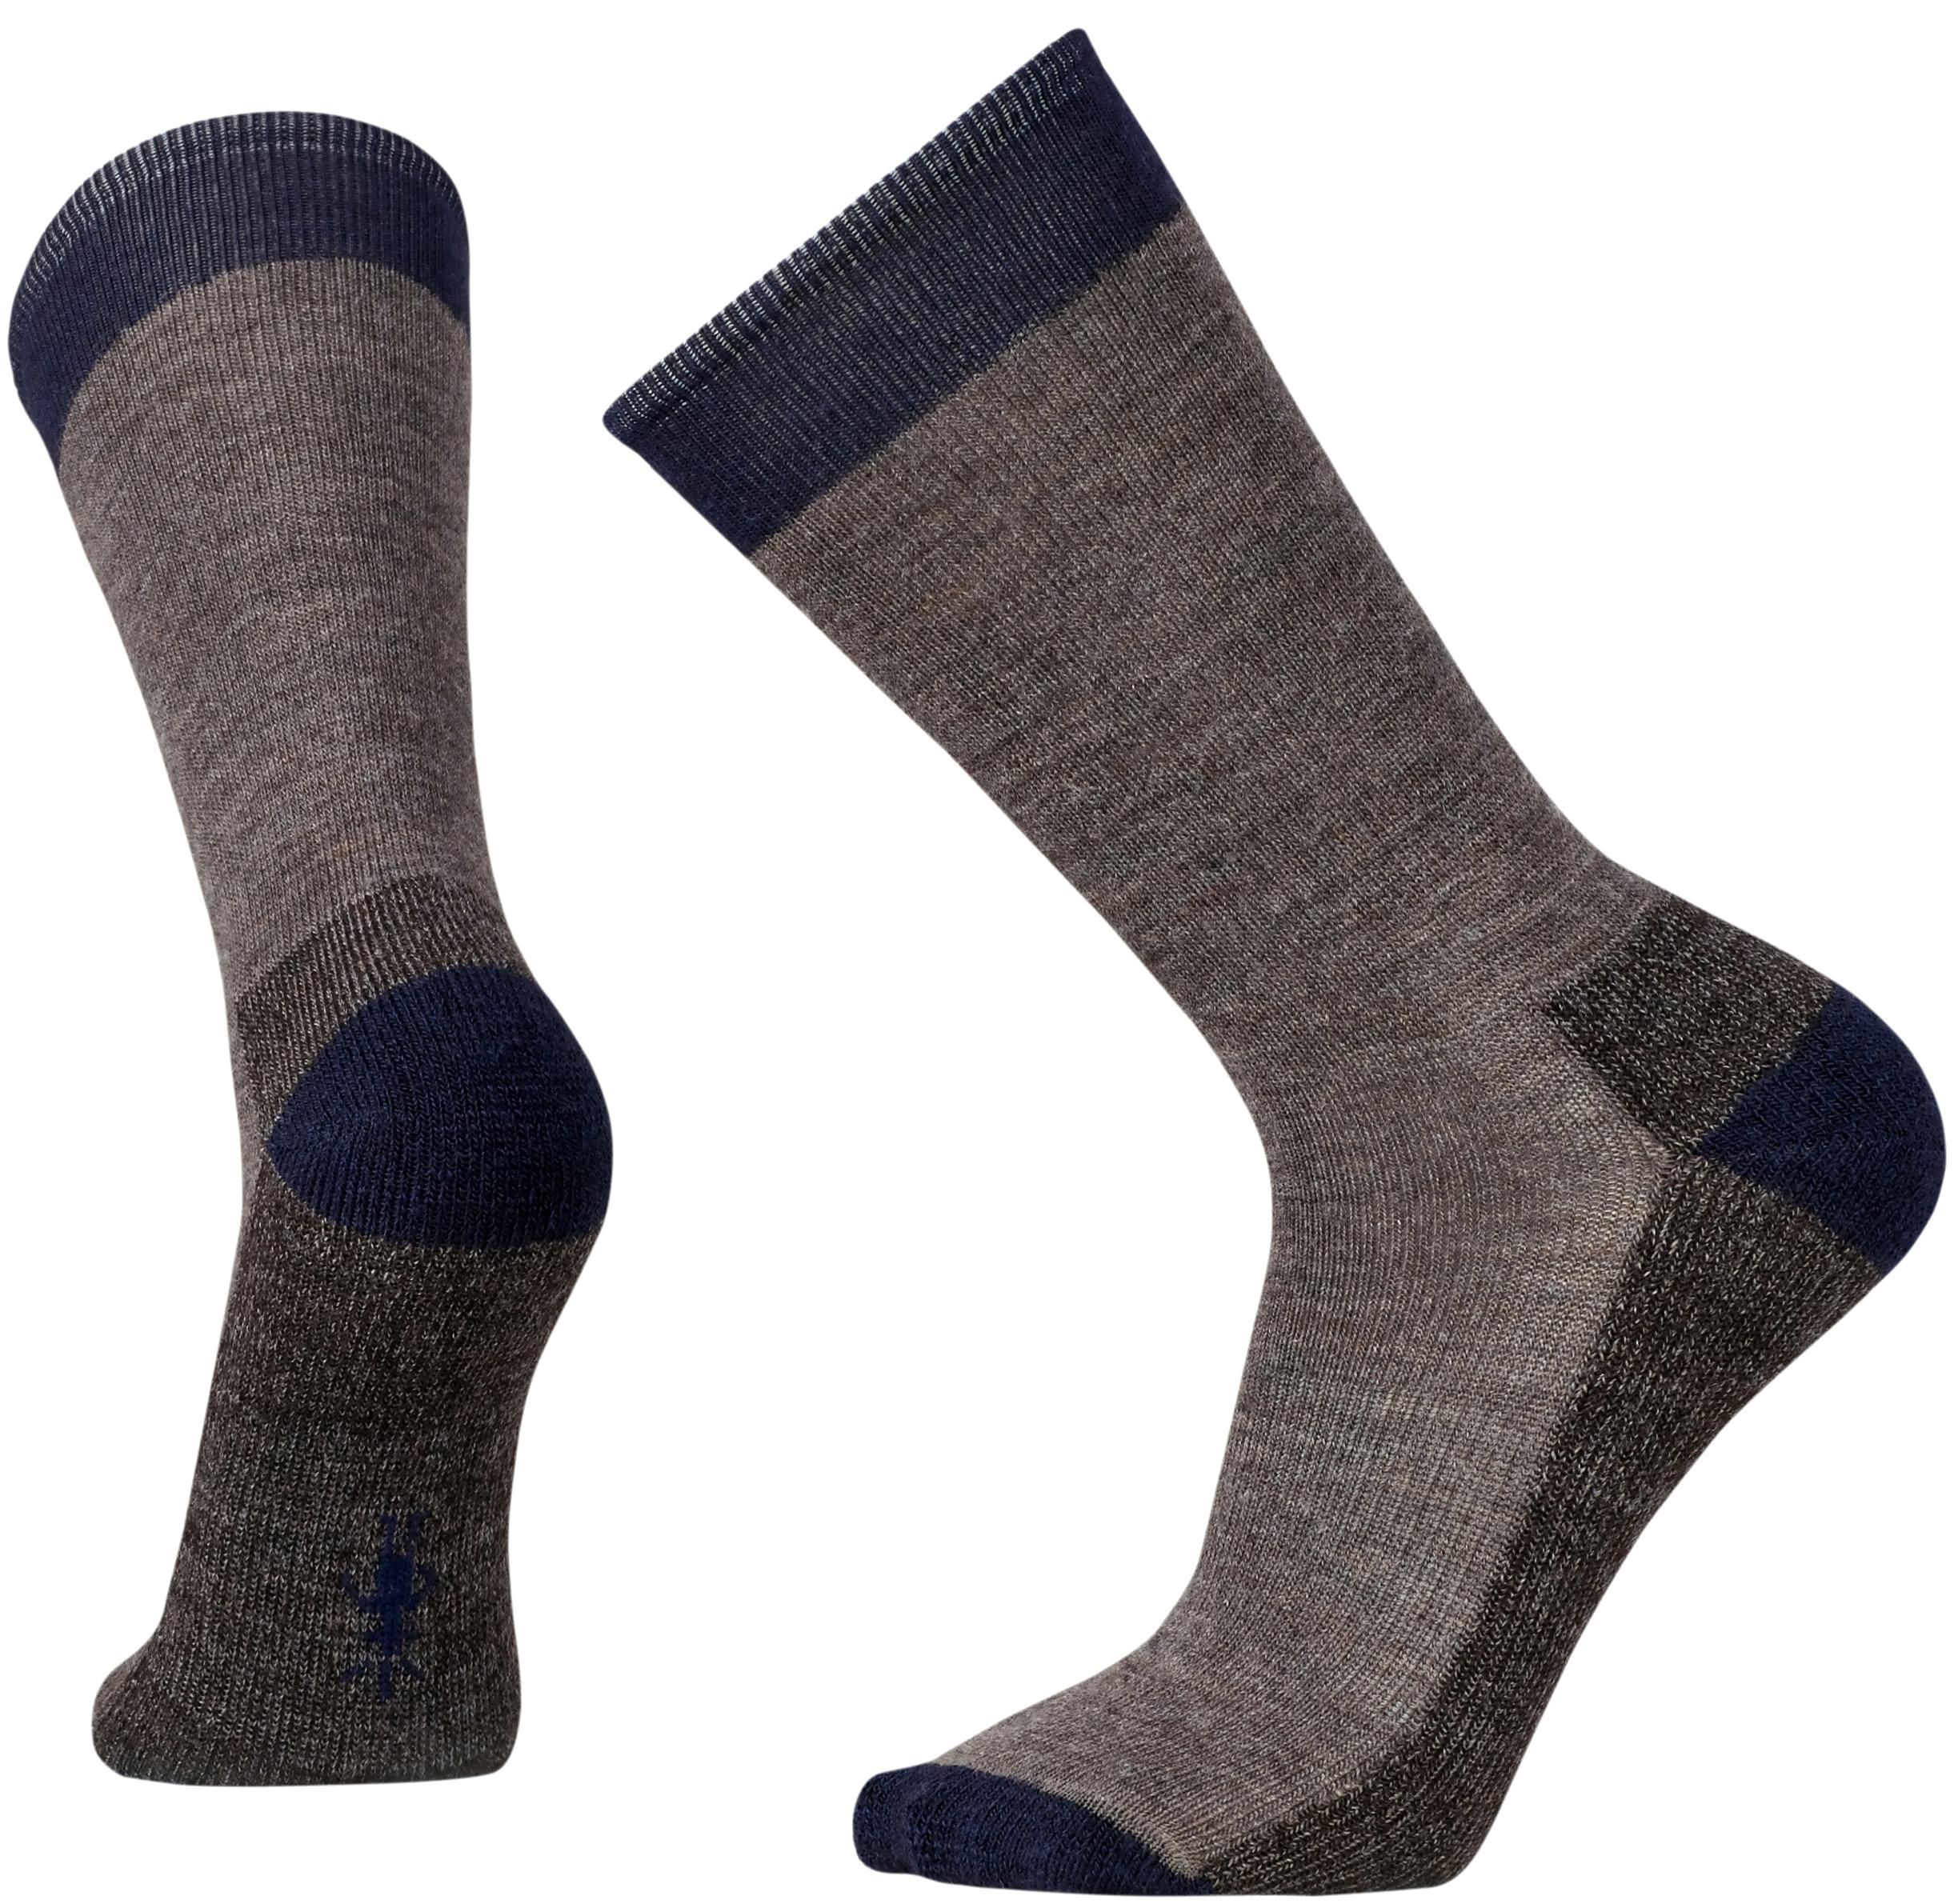 b115dc604b1e7 Smartwool Hiker Street Crew Socks - Men's   MEC